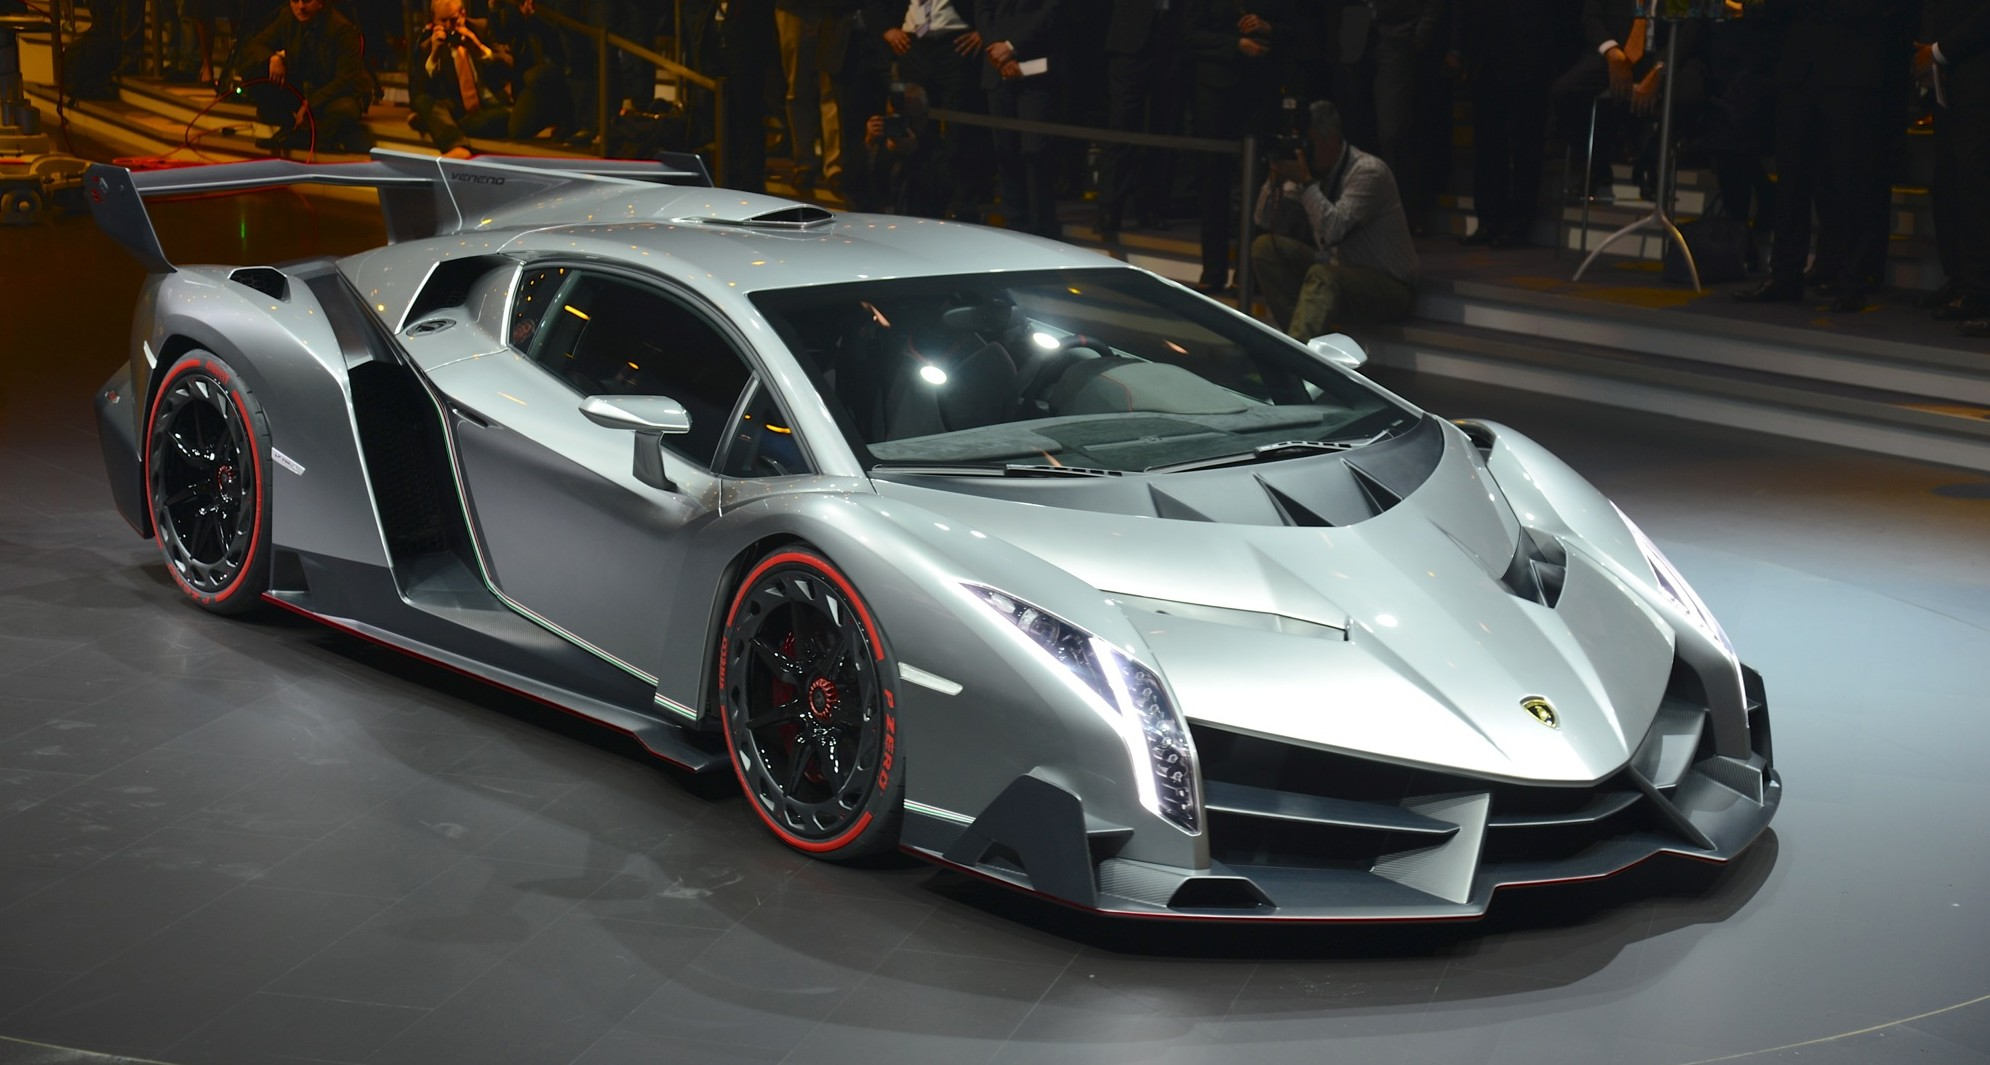 en edition online elemento purchase overseas parts sesto vehicles nnt lamborghini